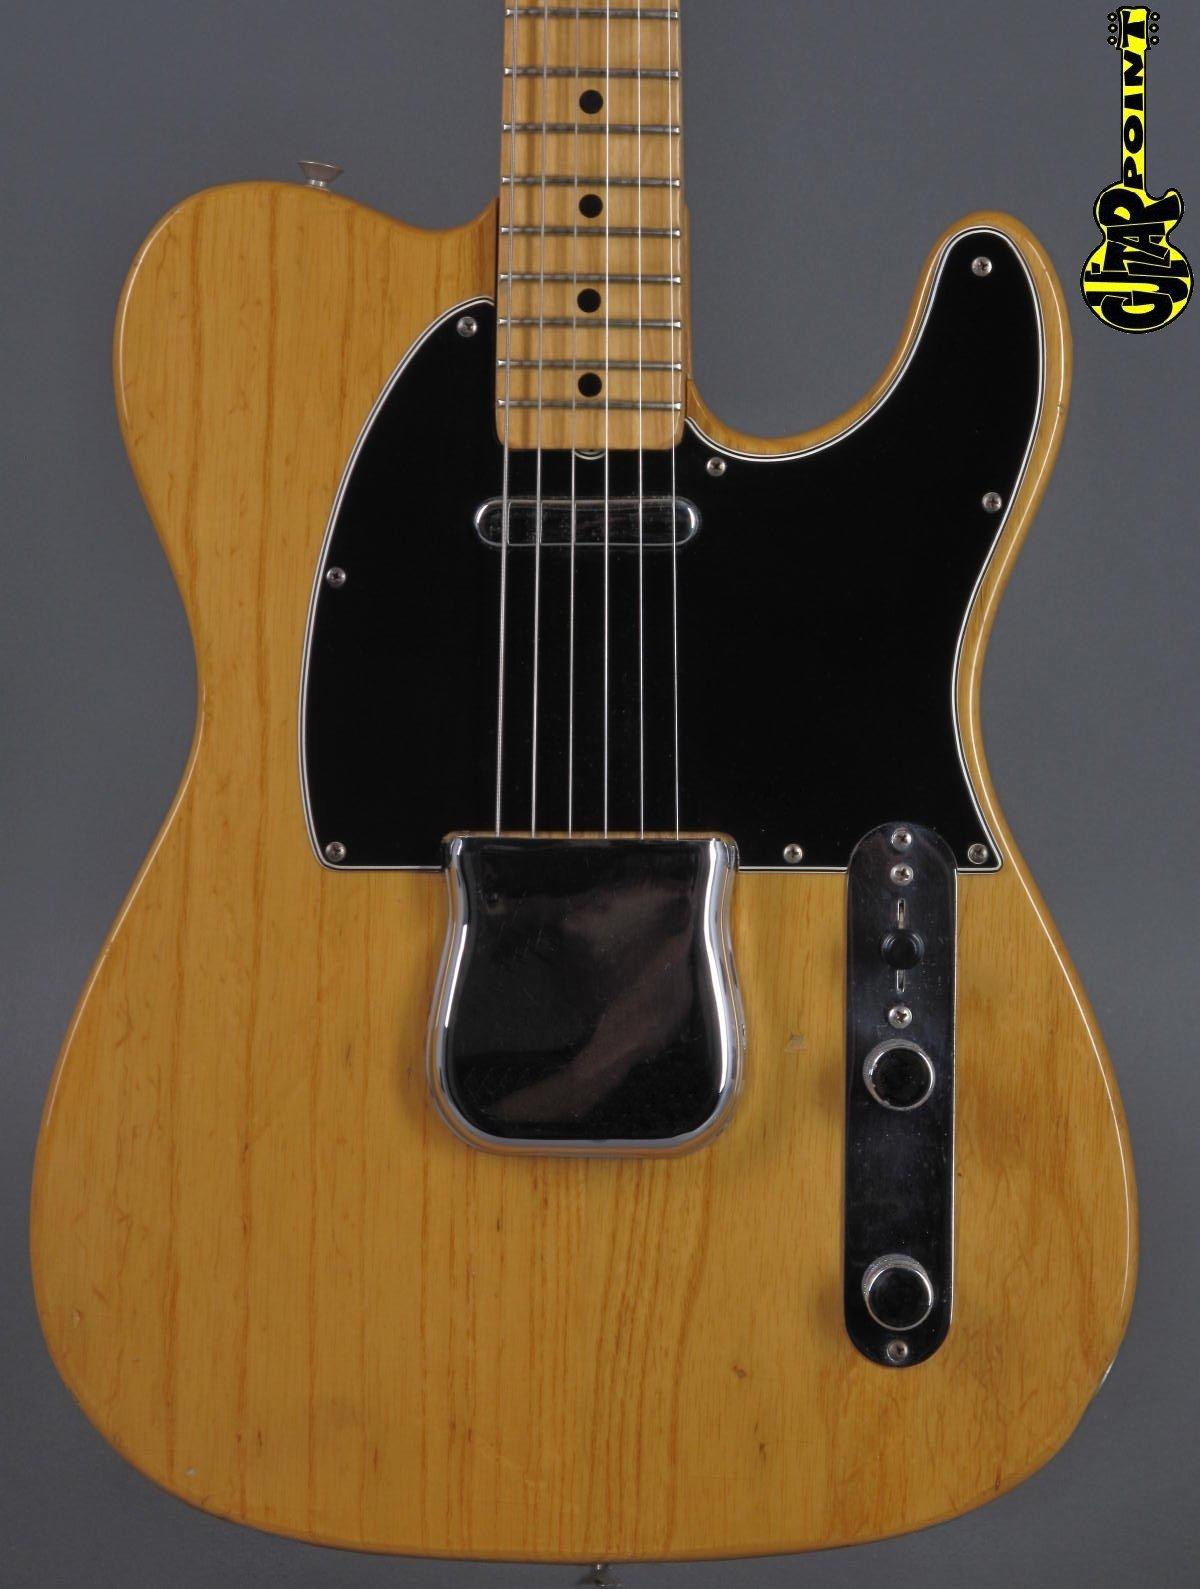 1976 Fender Telecaster - Natural   ...lightweight !